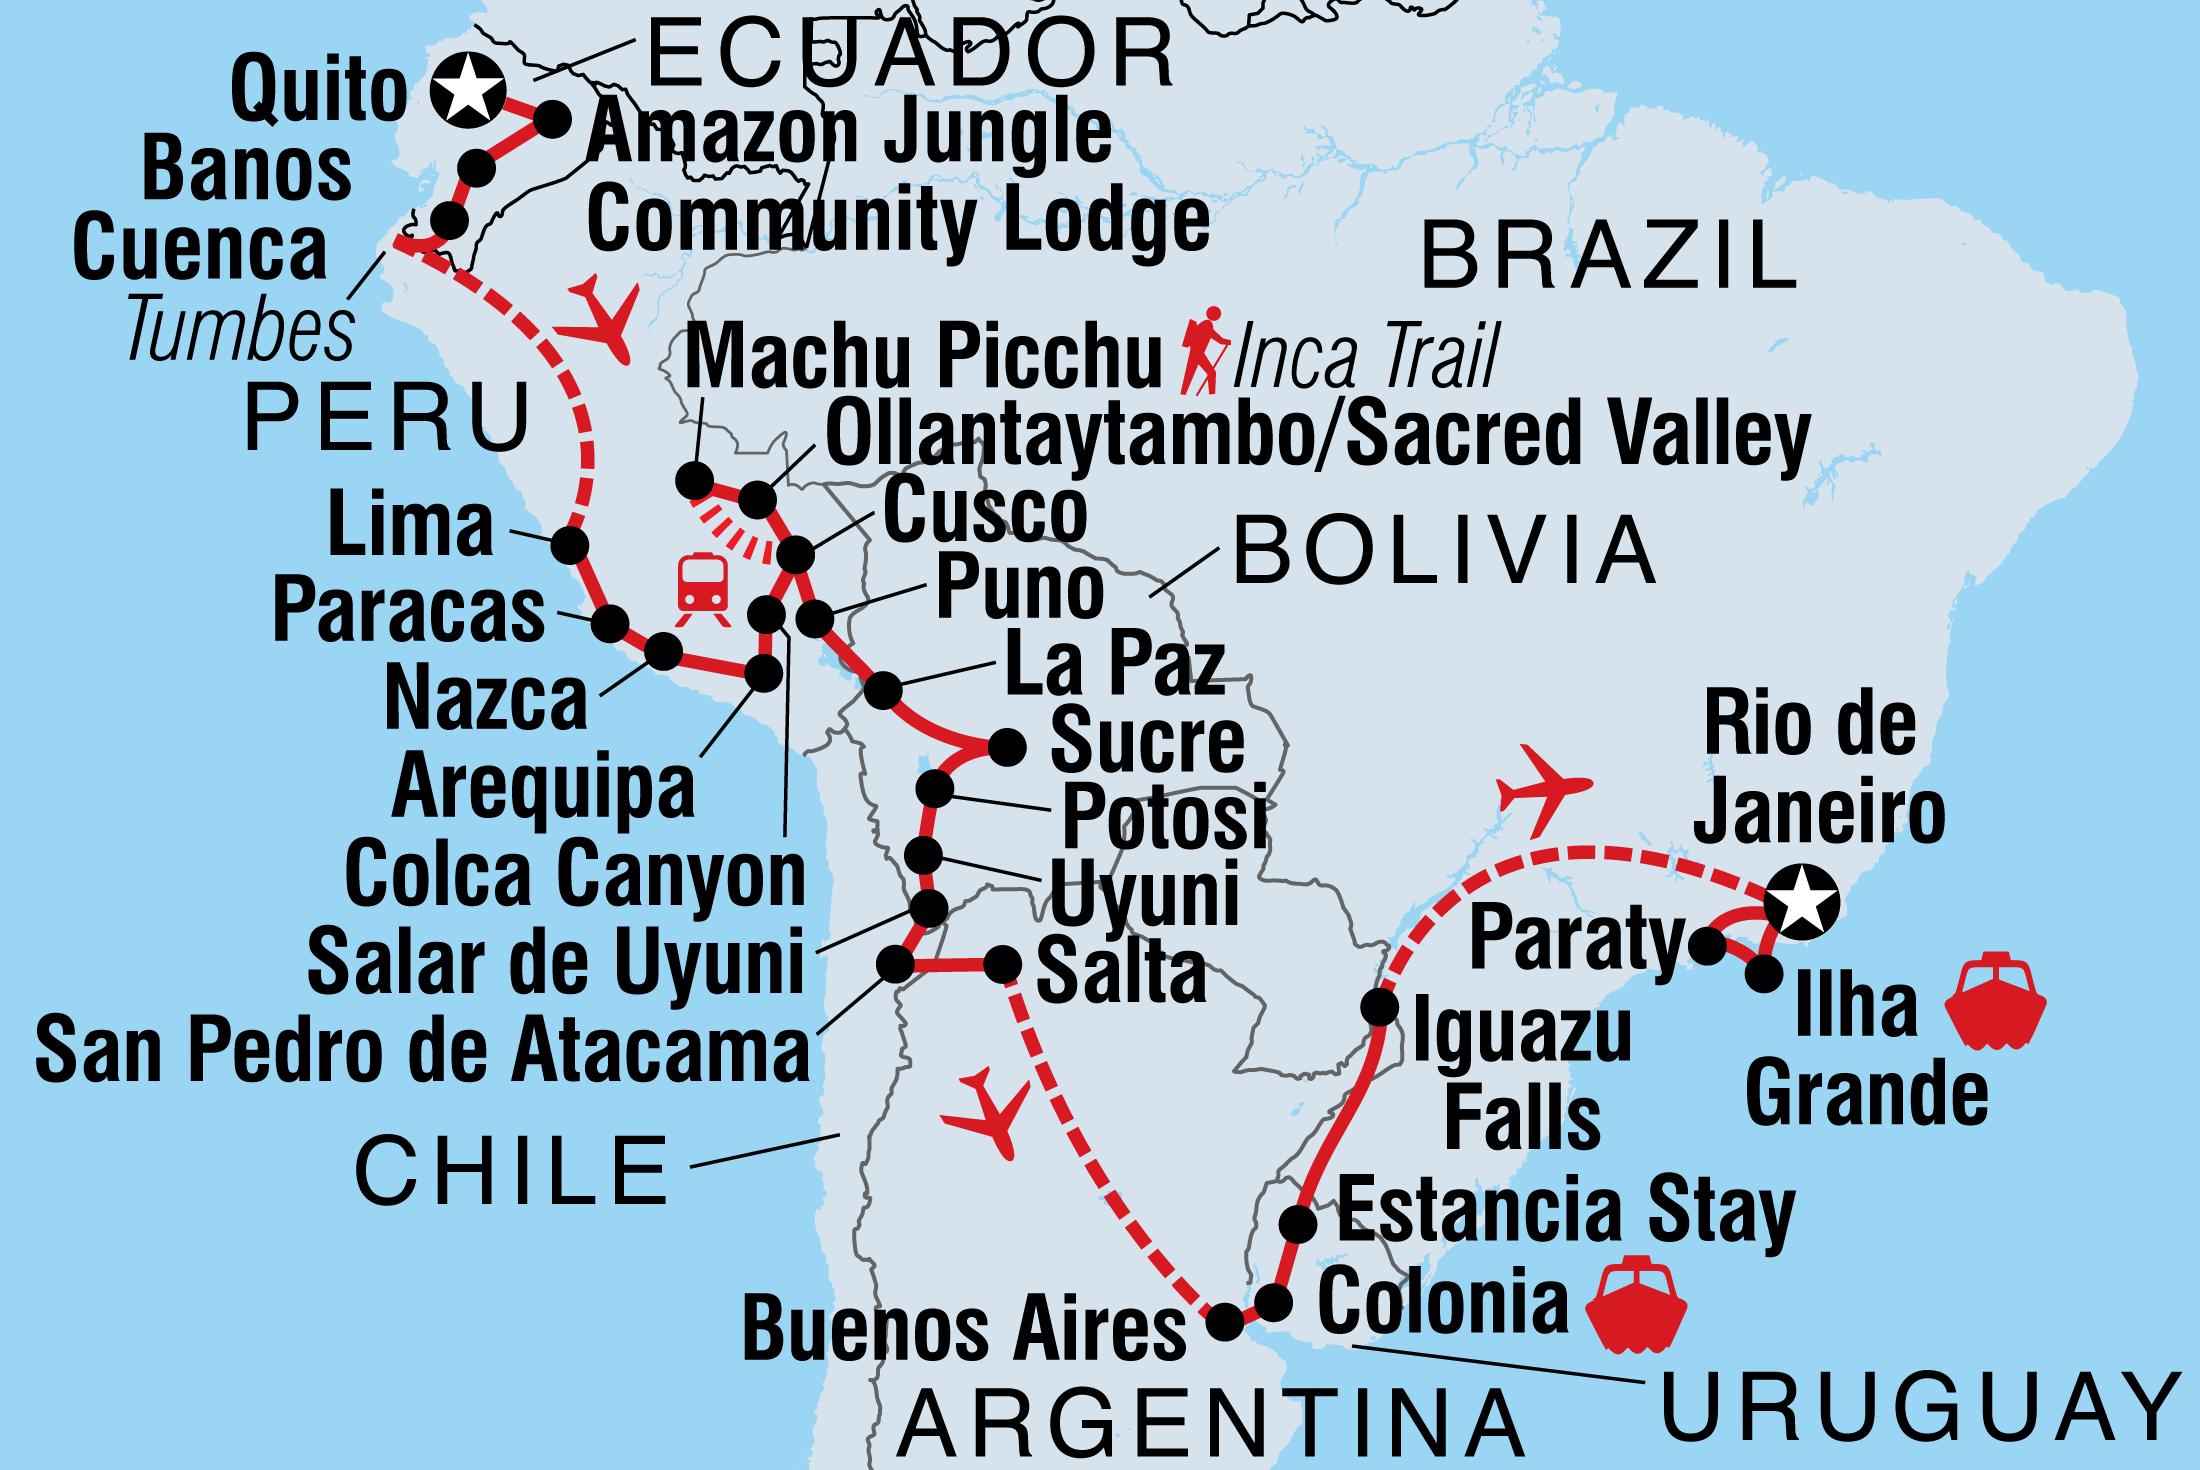 Uruguay Tours & Travel | Intrepid Travel US